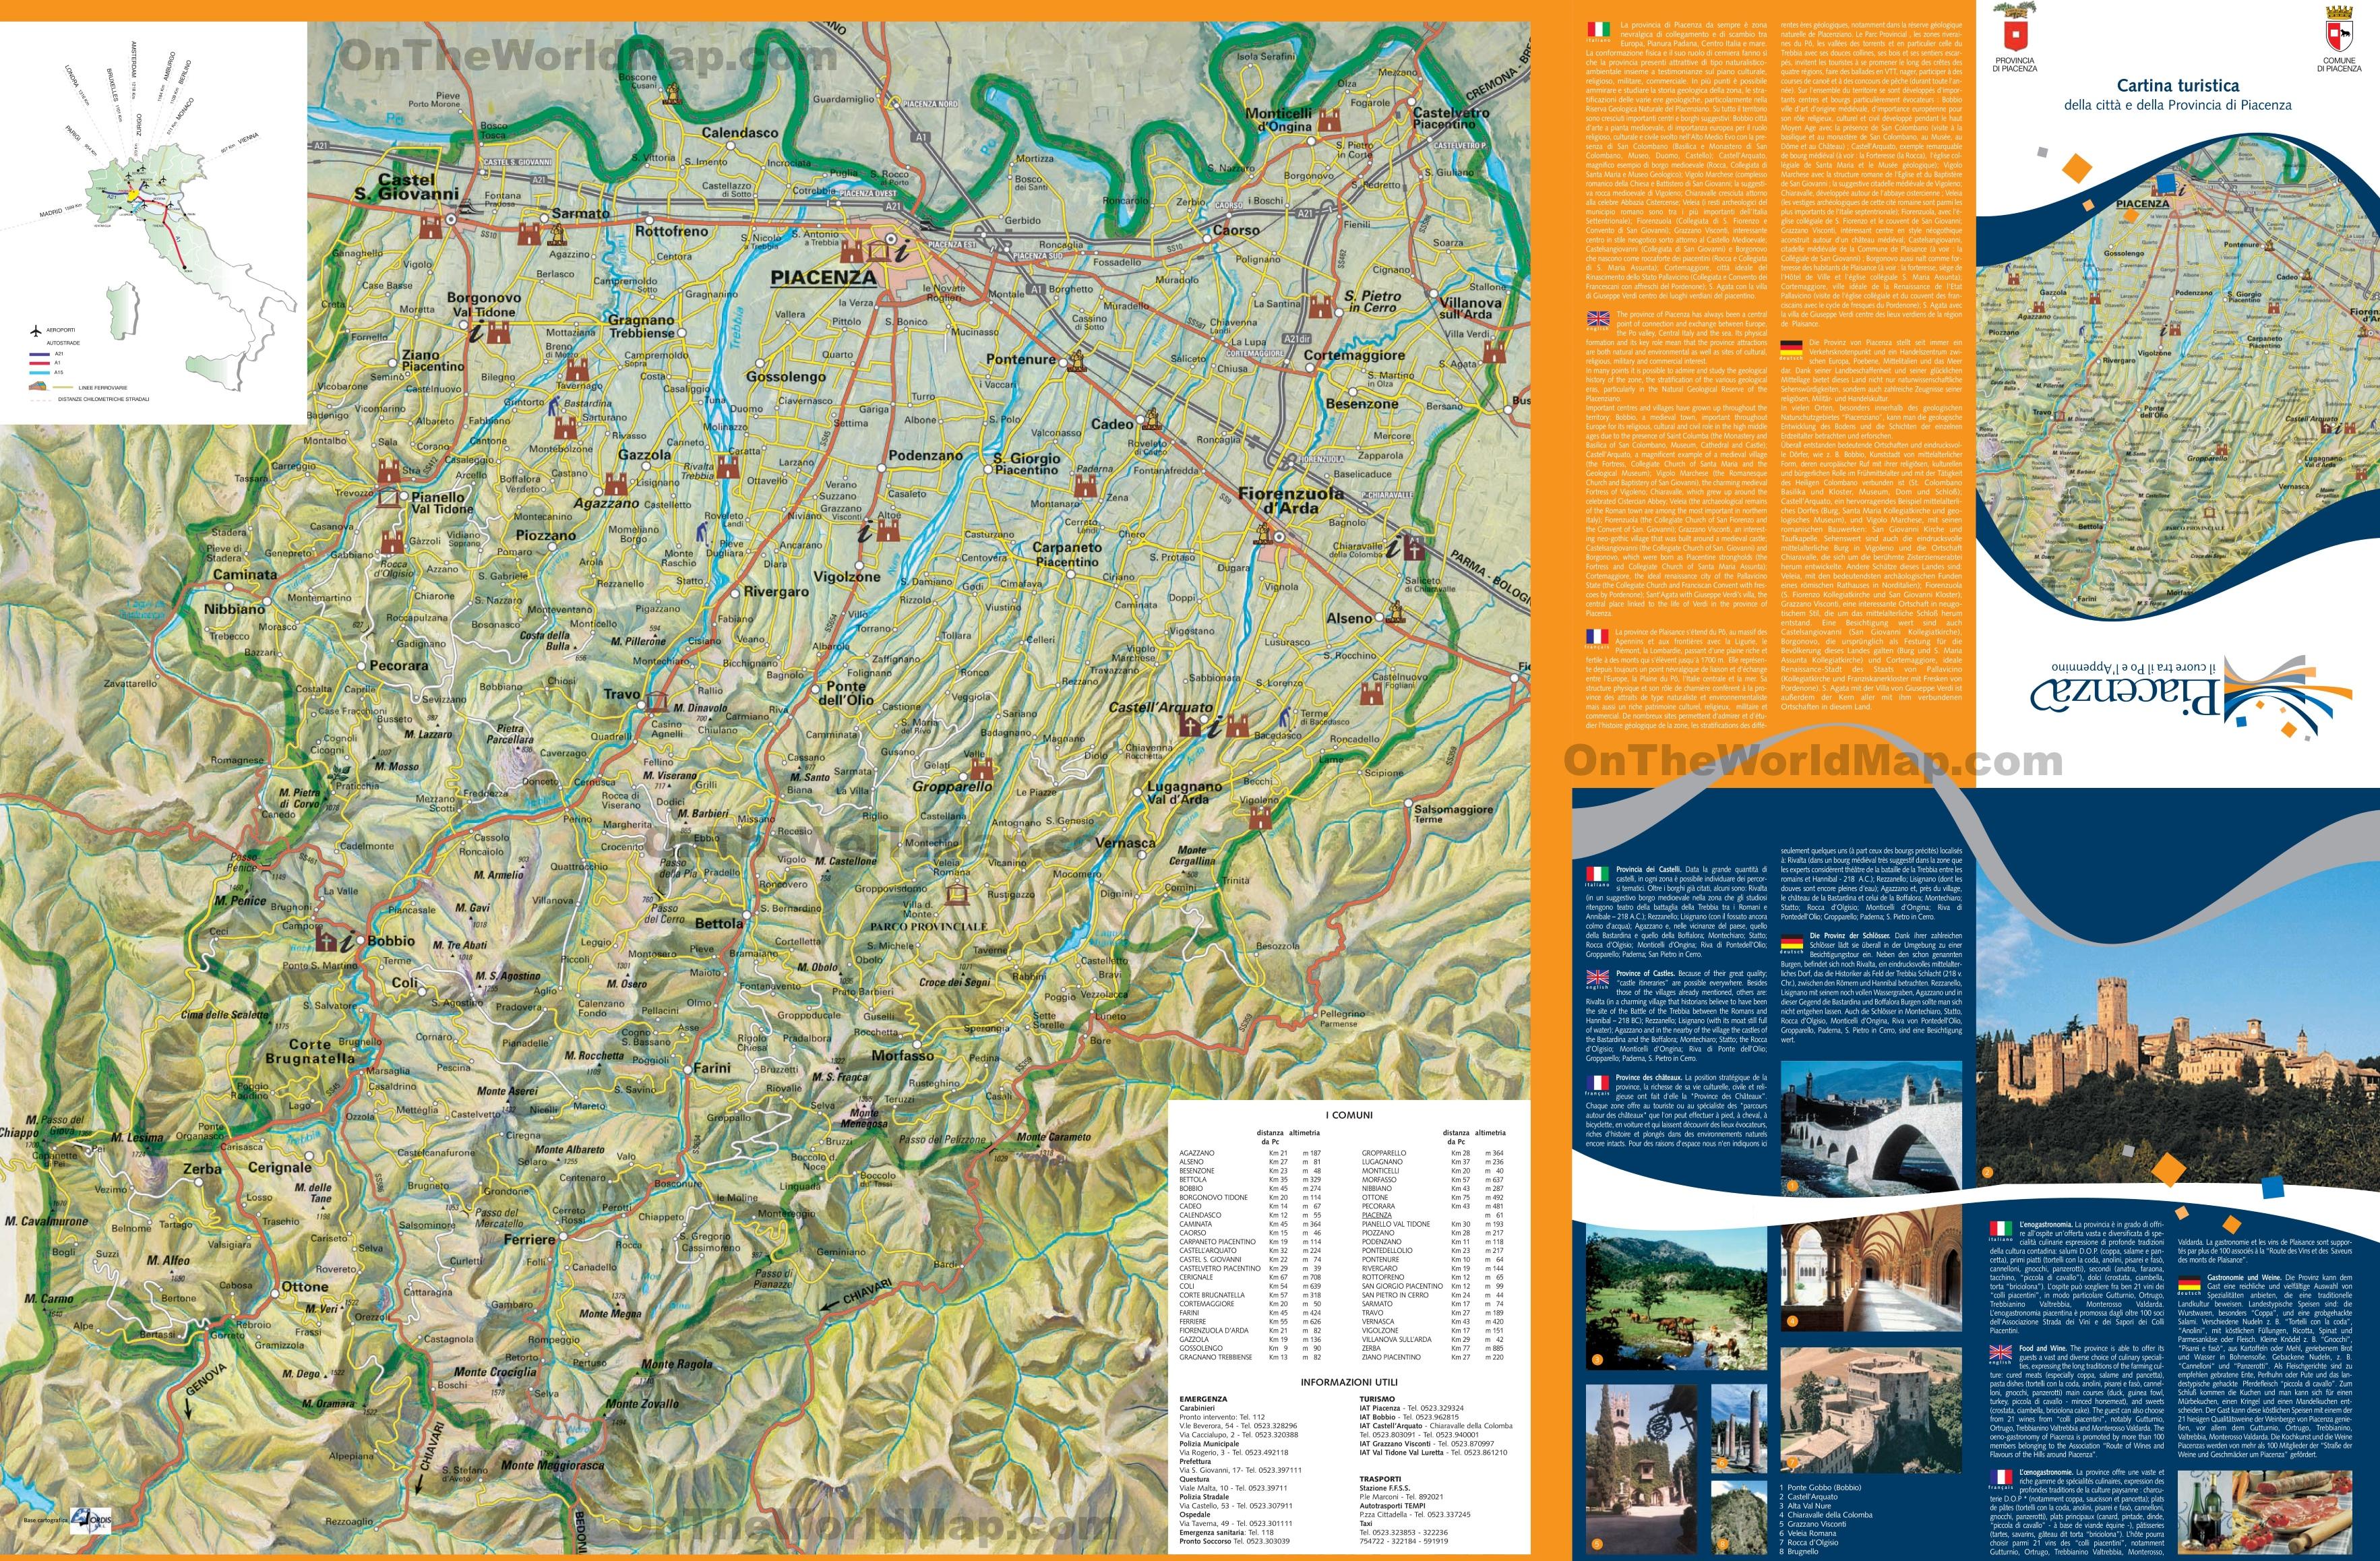 Province of Piacenza tourist map